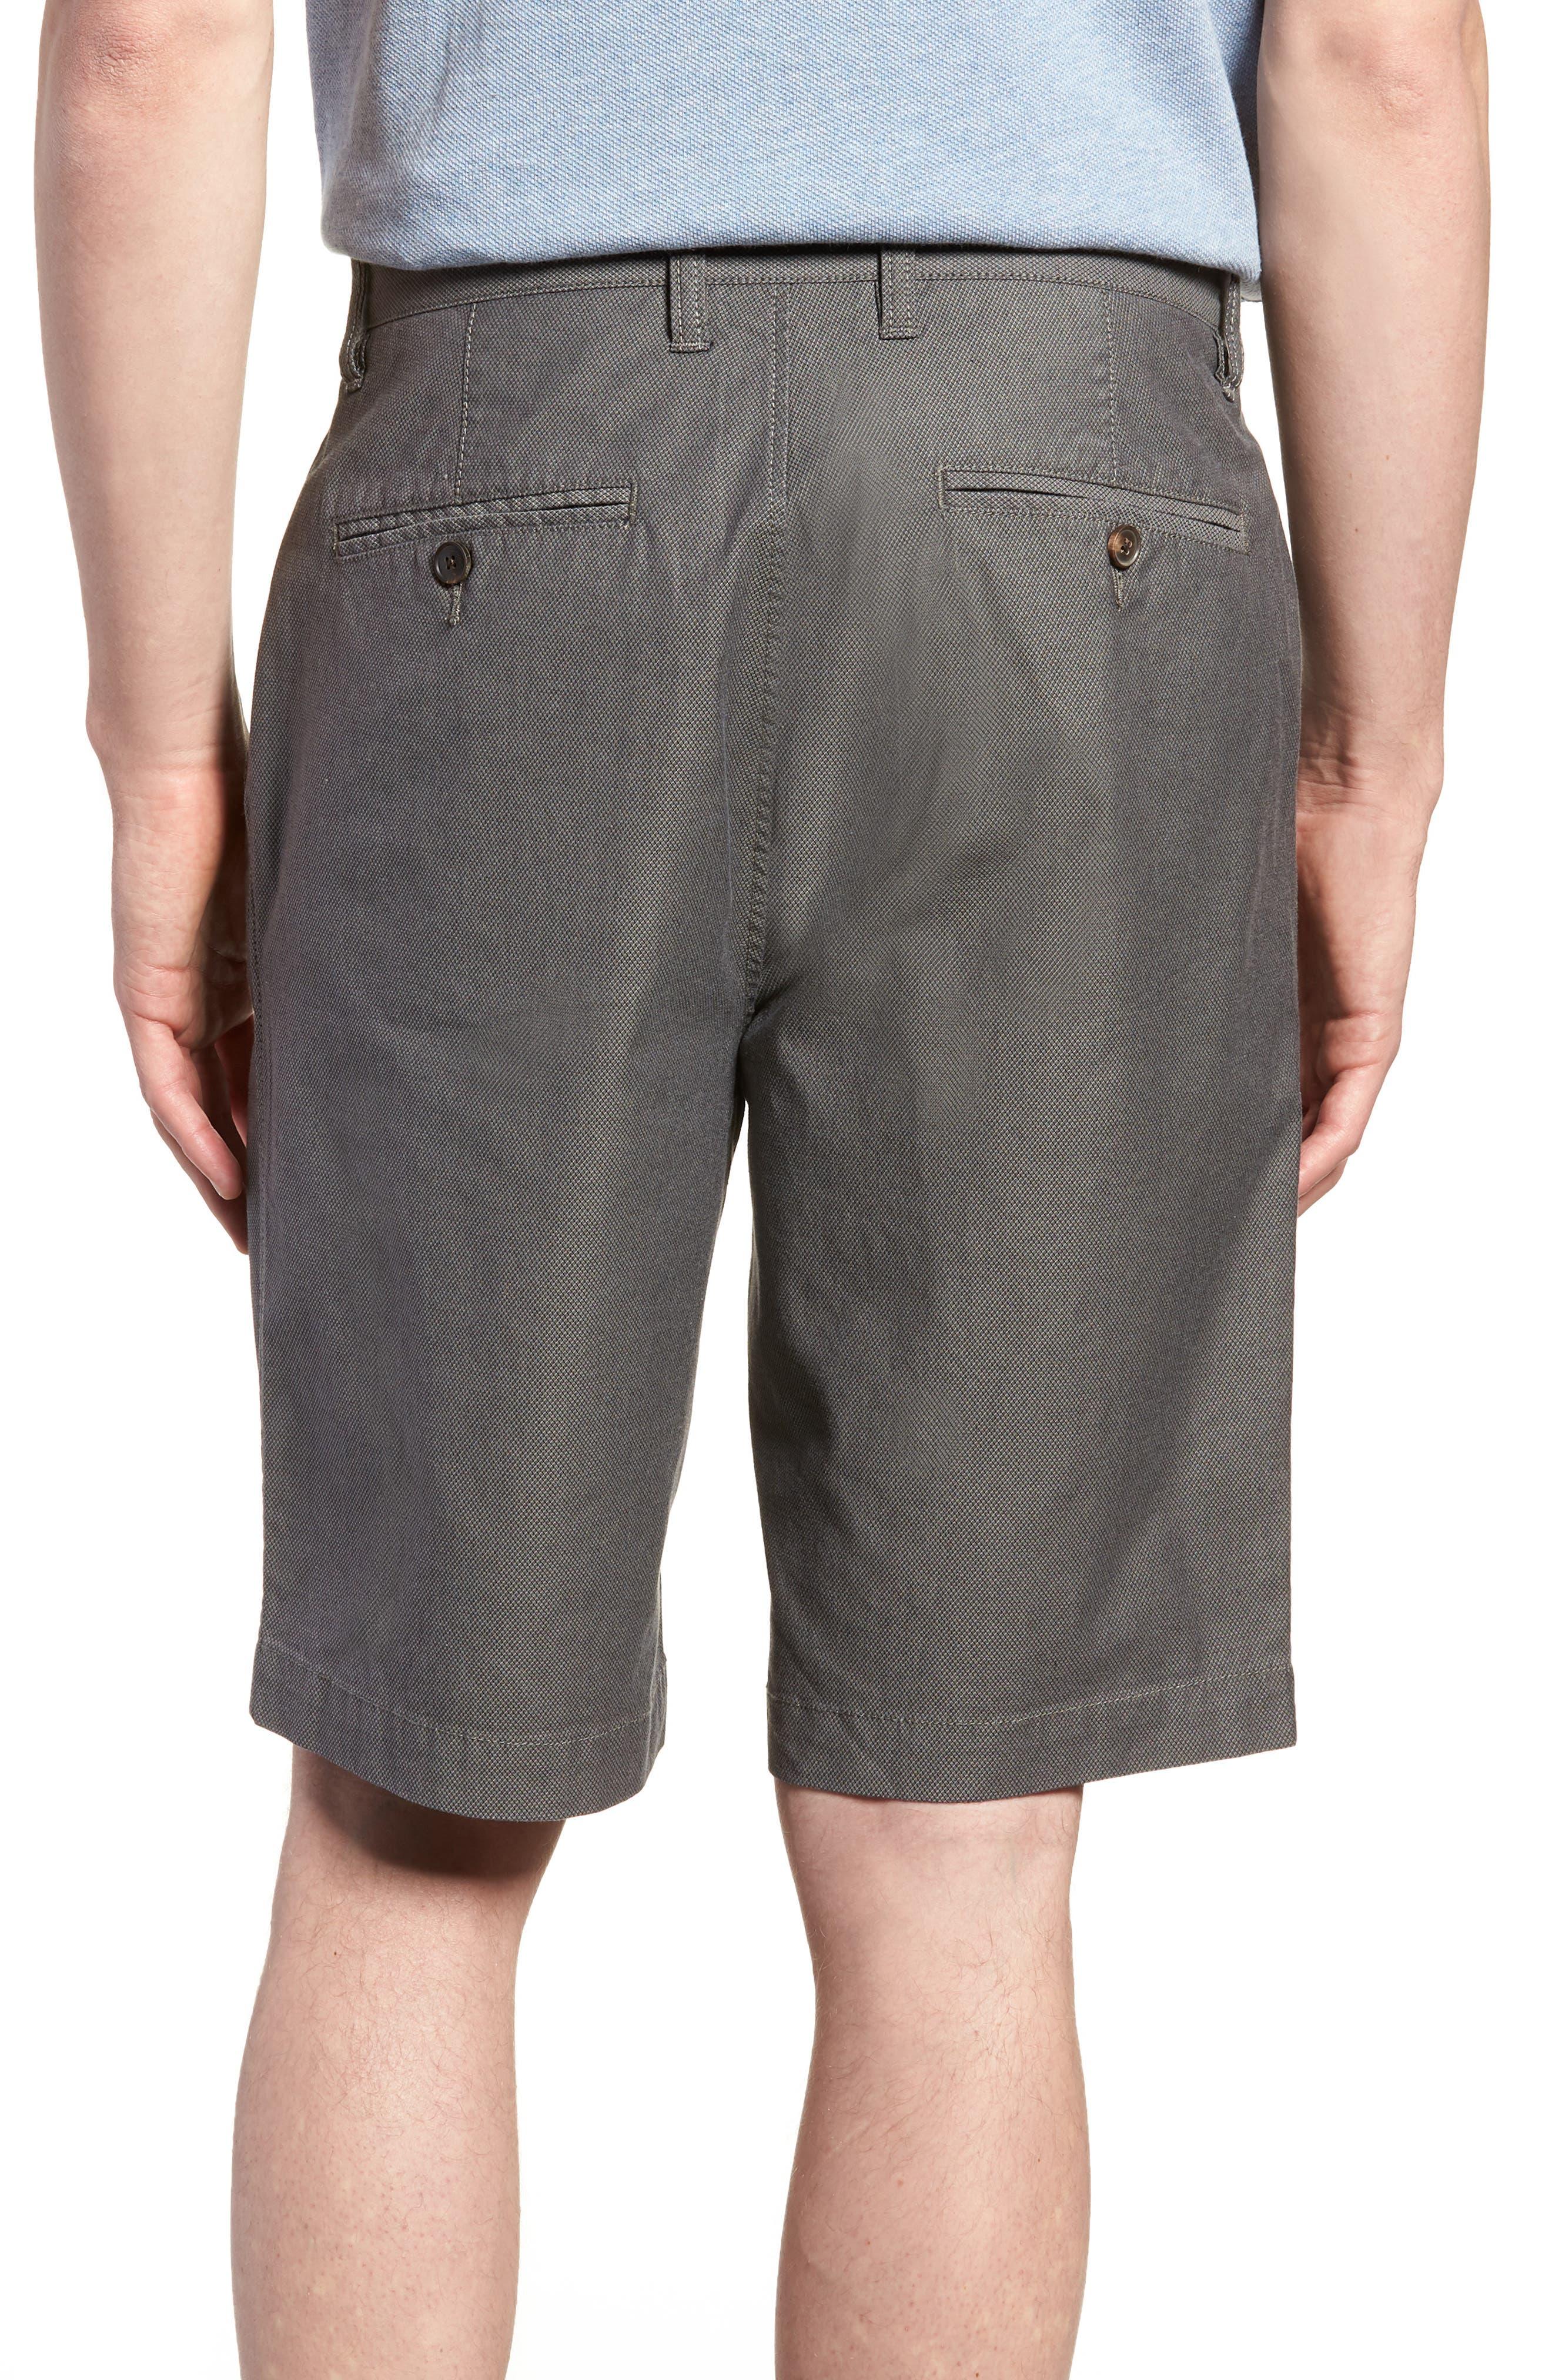 RODD & GUNN,                             Army Bay Regular Fit Shorts,                             Alternate thumbnail 2, color,                             023